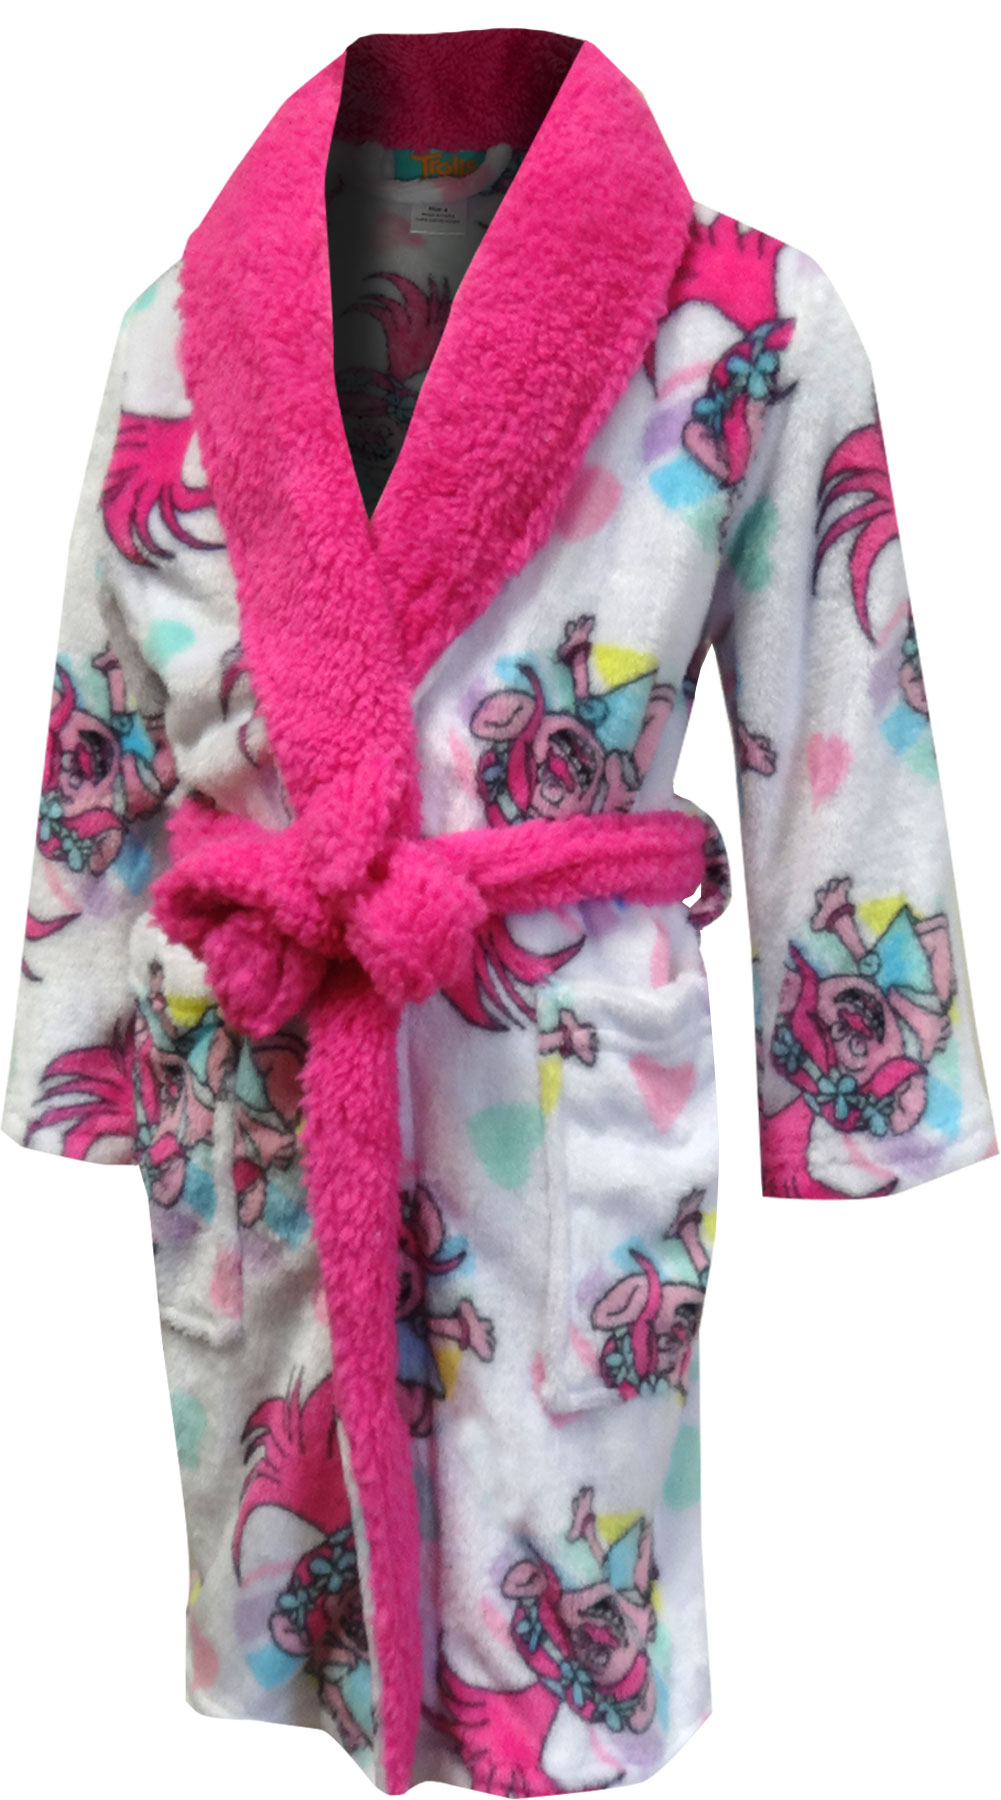 Image of Trolls Movie Princess Poppy Fleece Robe for girls